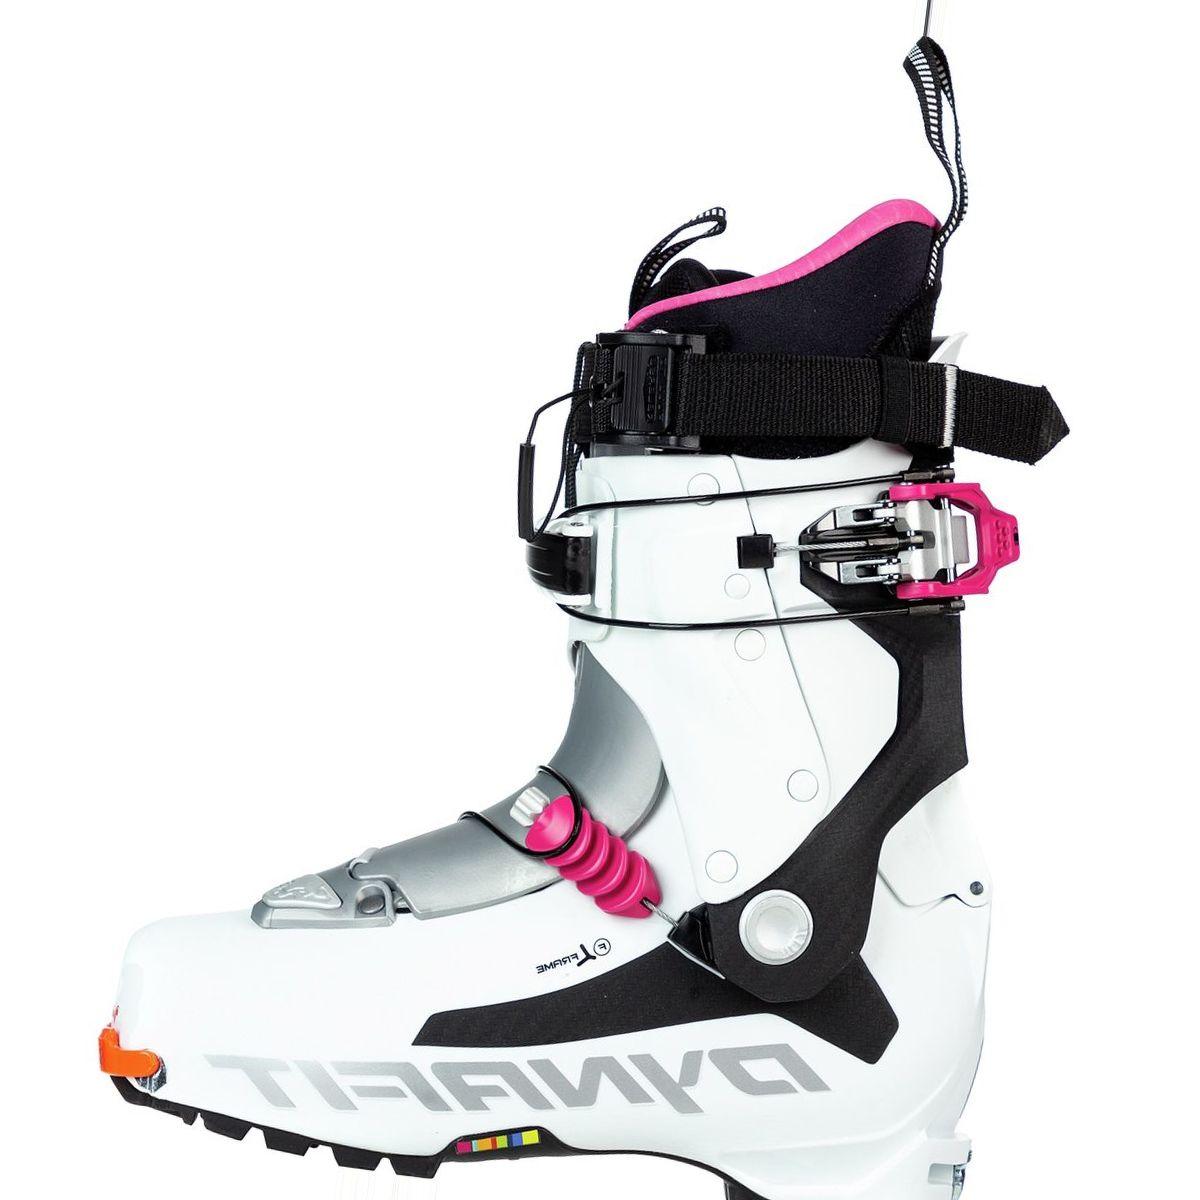 Dynafit TLT7 Expedition CR Ski Boot - Women's